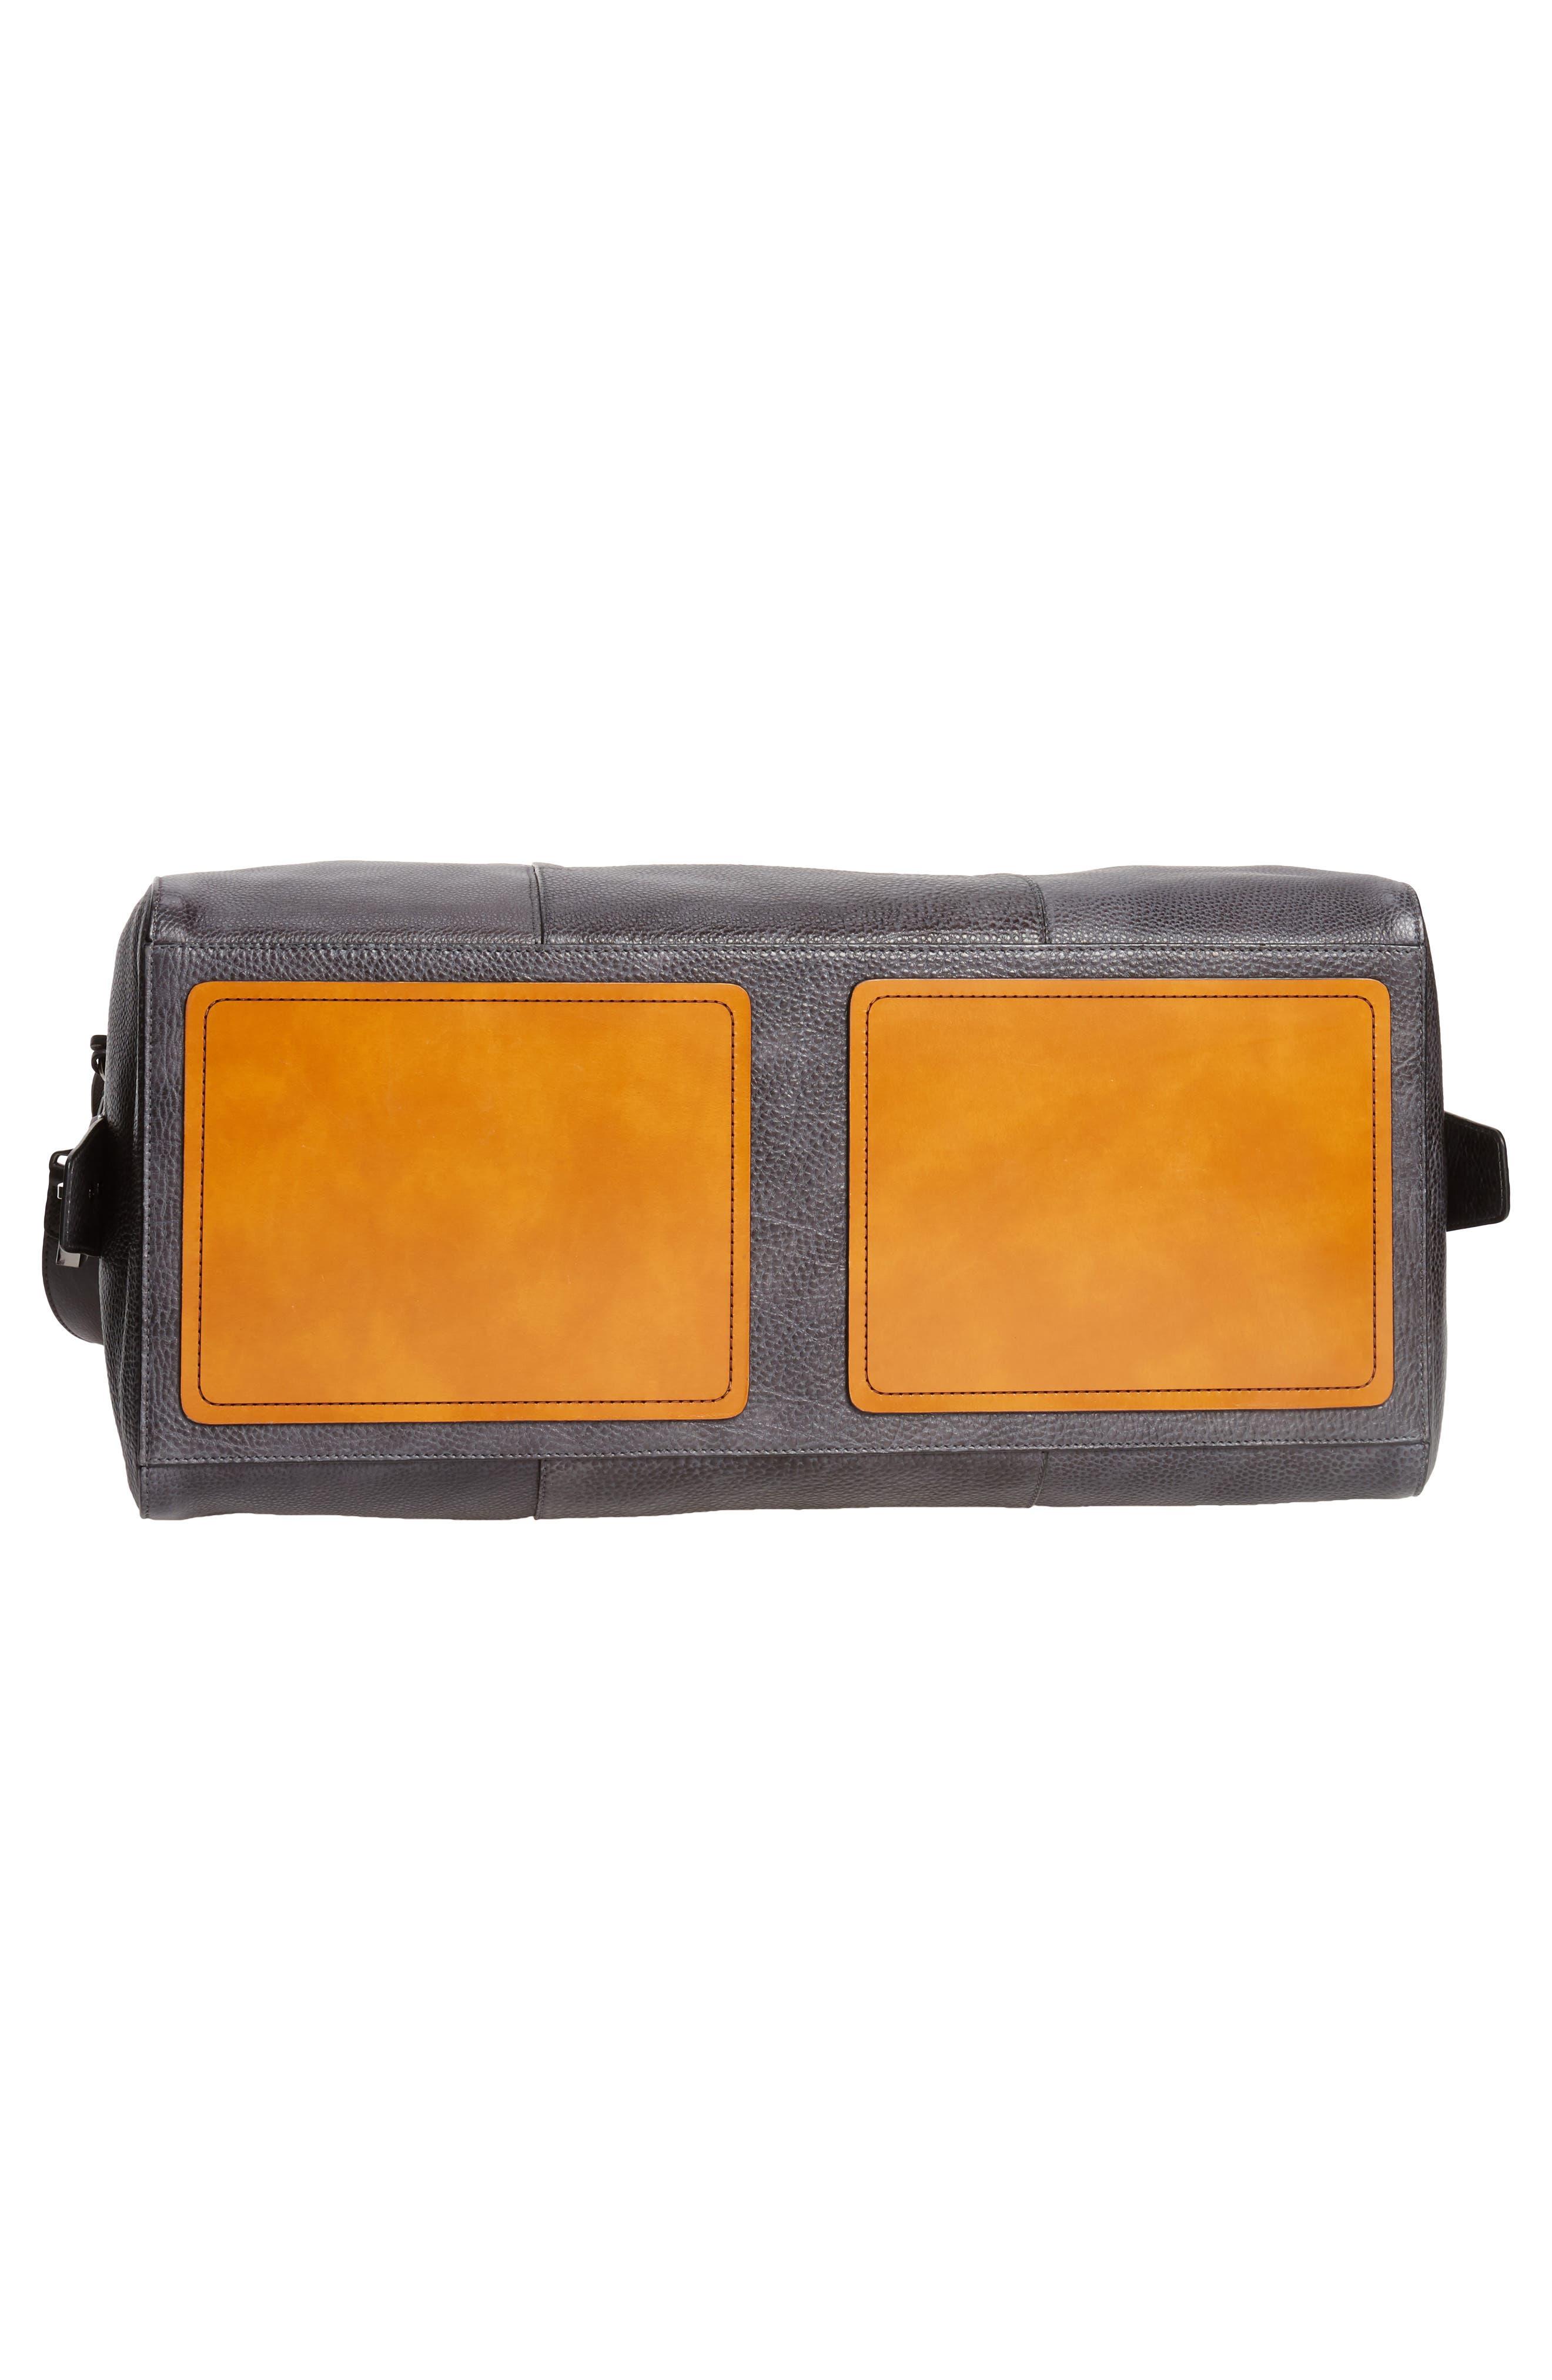 Traveler Leather Duffel Bag,                             Alternate thumbnail 6, color,                             020